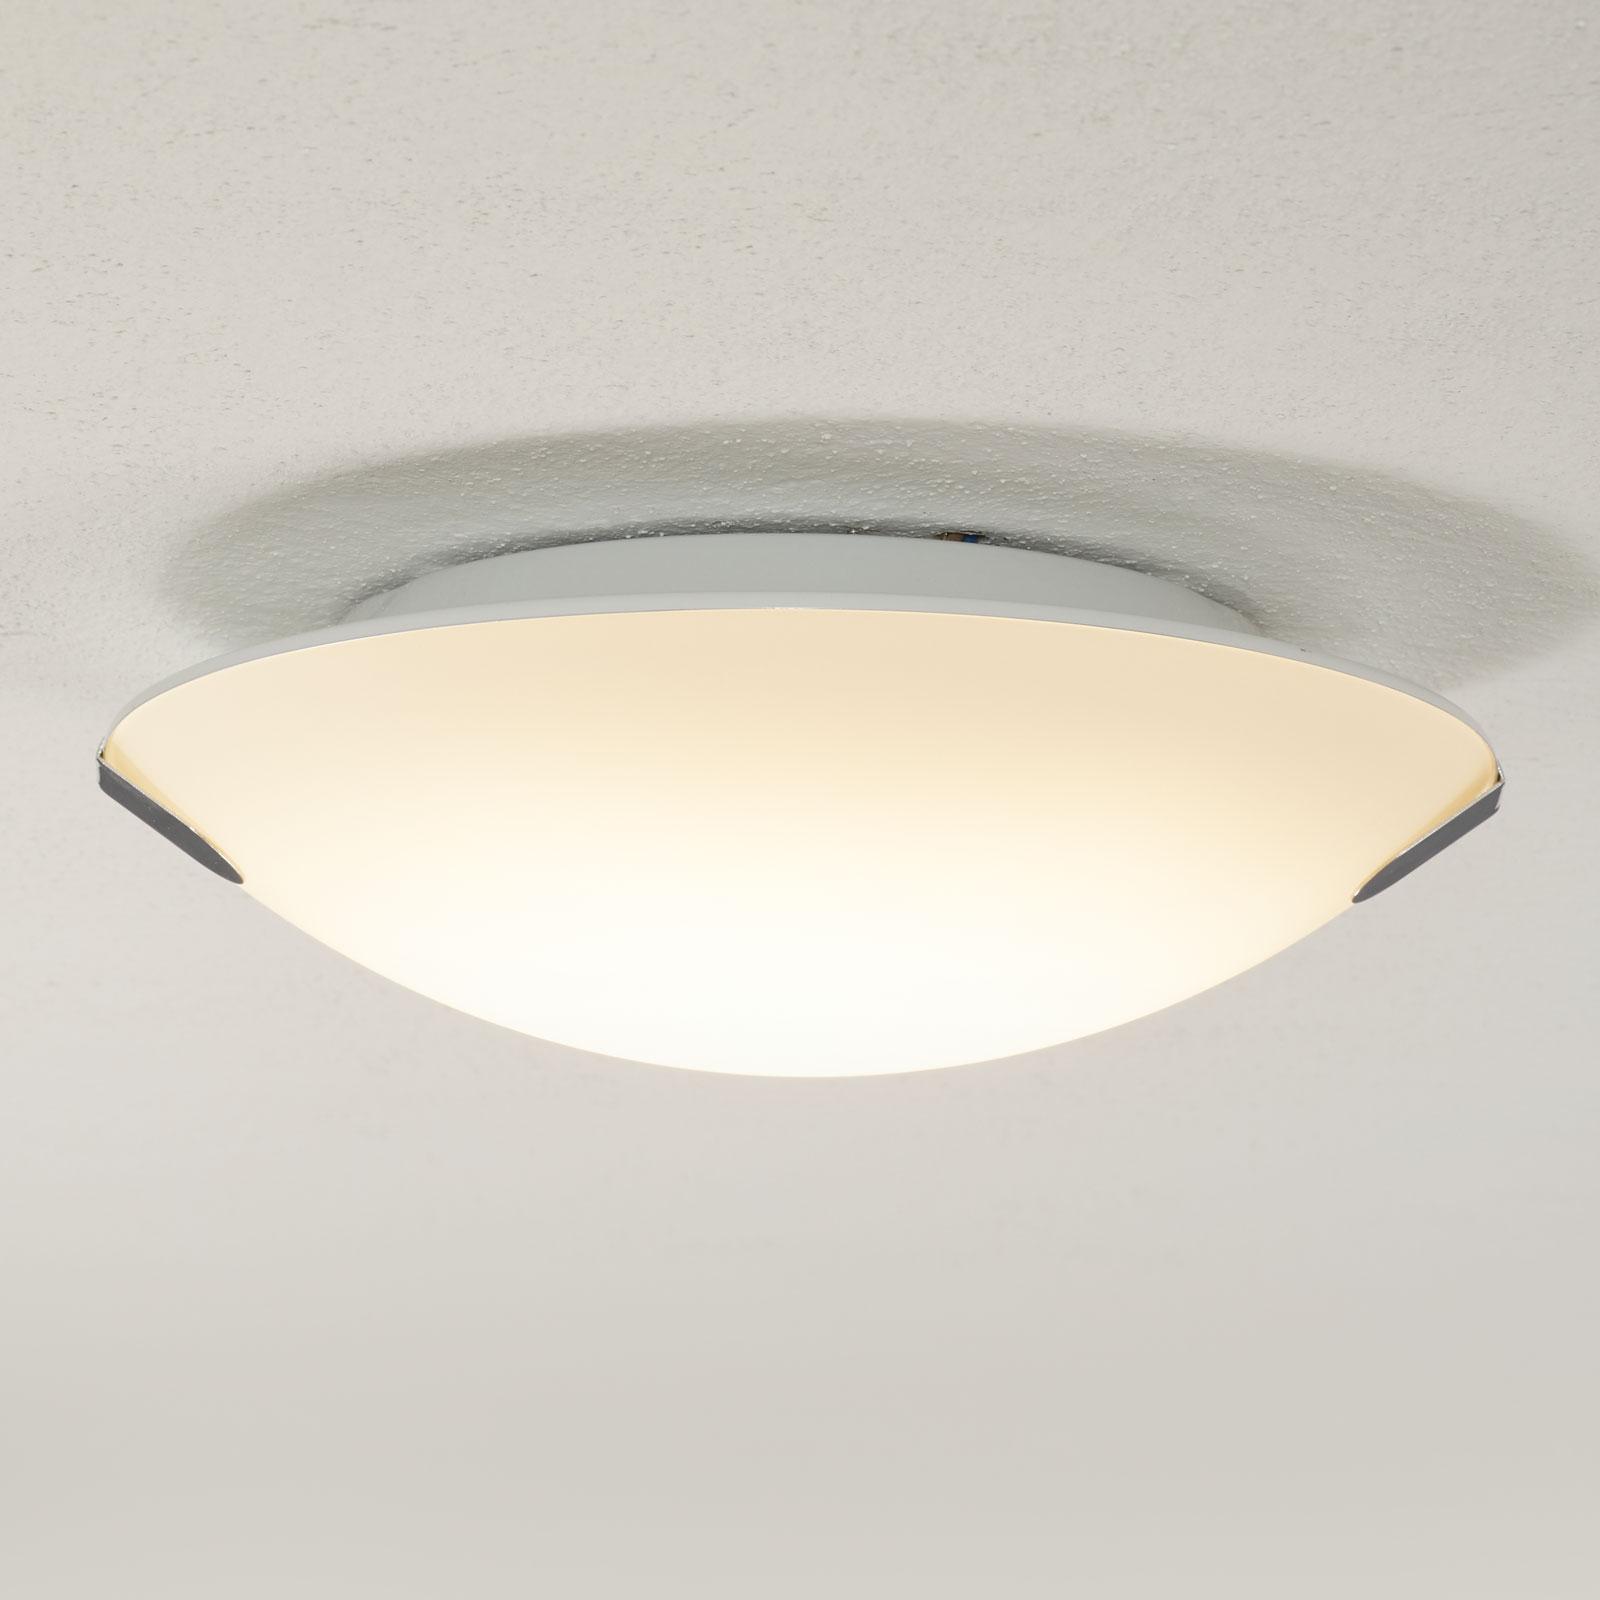 Arcchio Telie lampa sufitowa LED Ø 30 cm